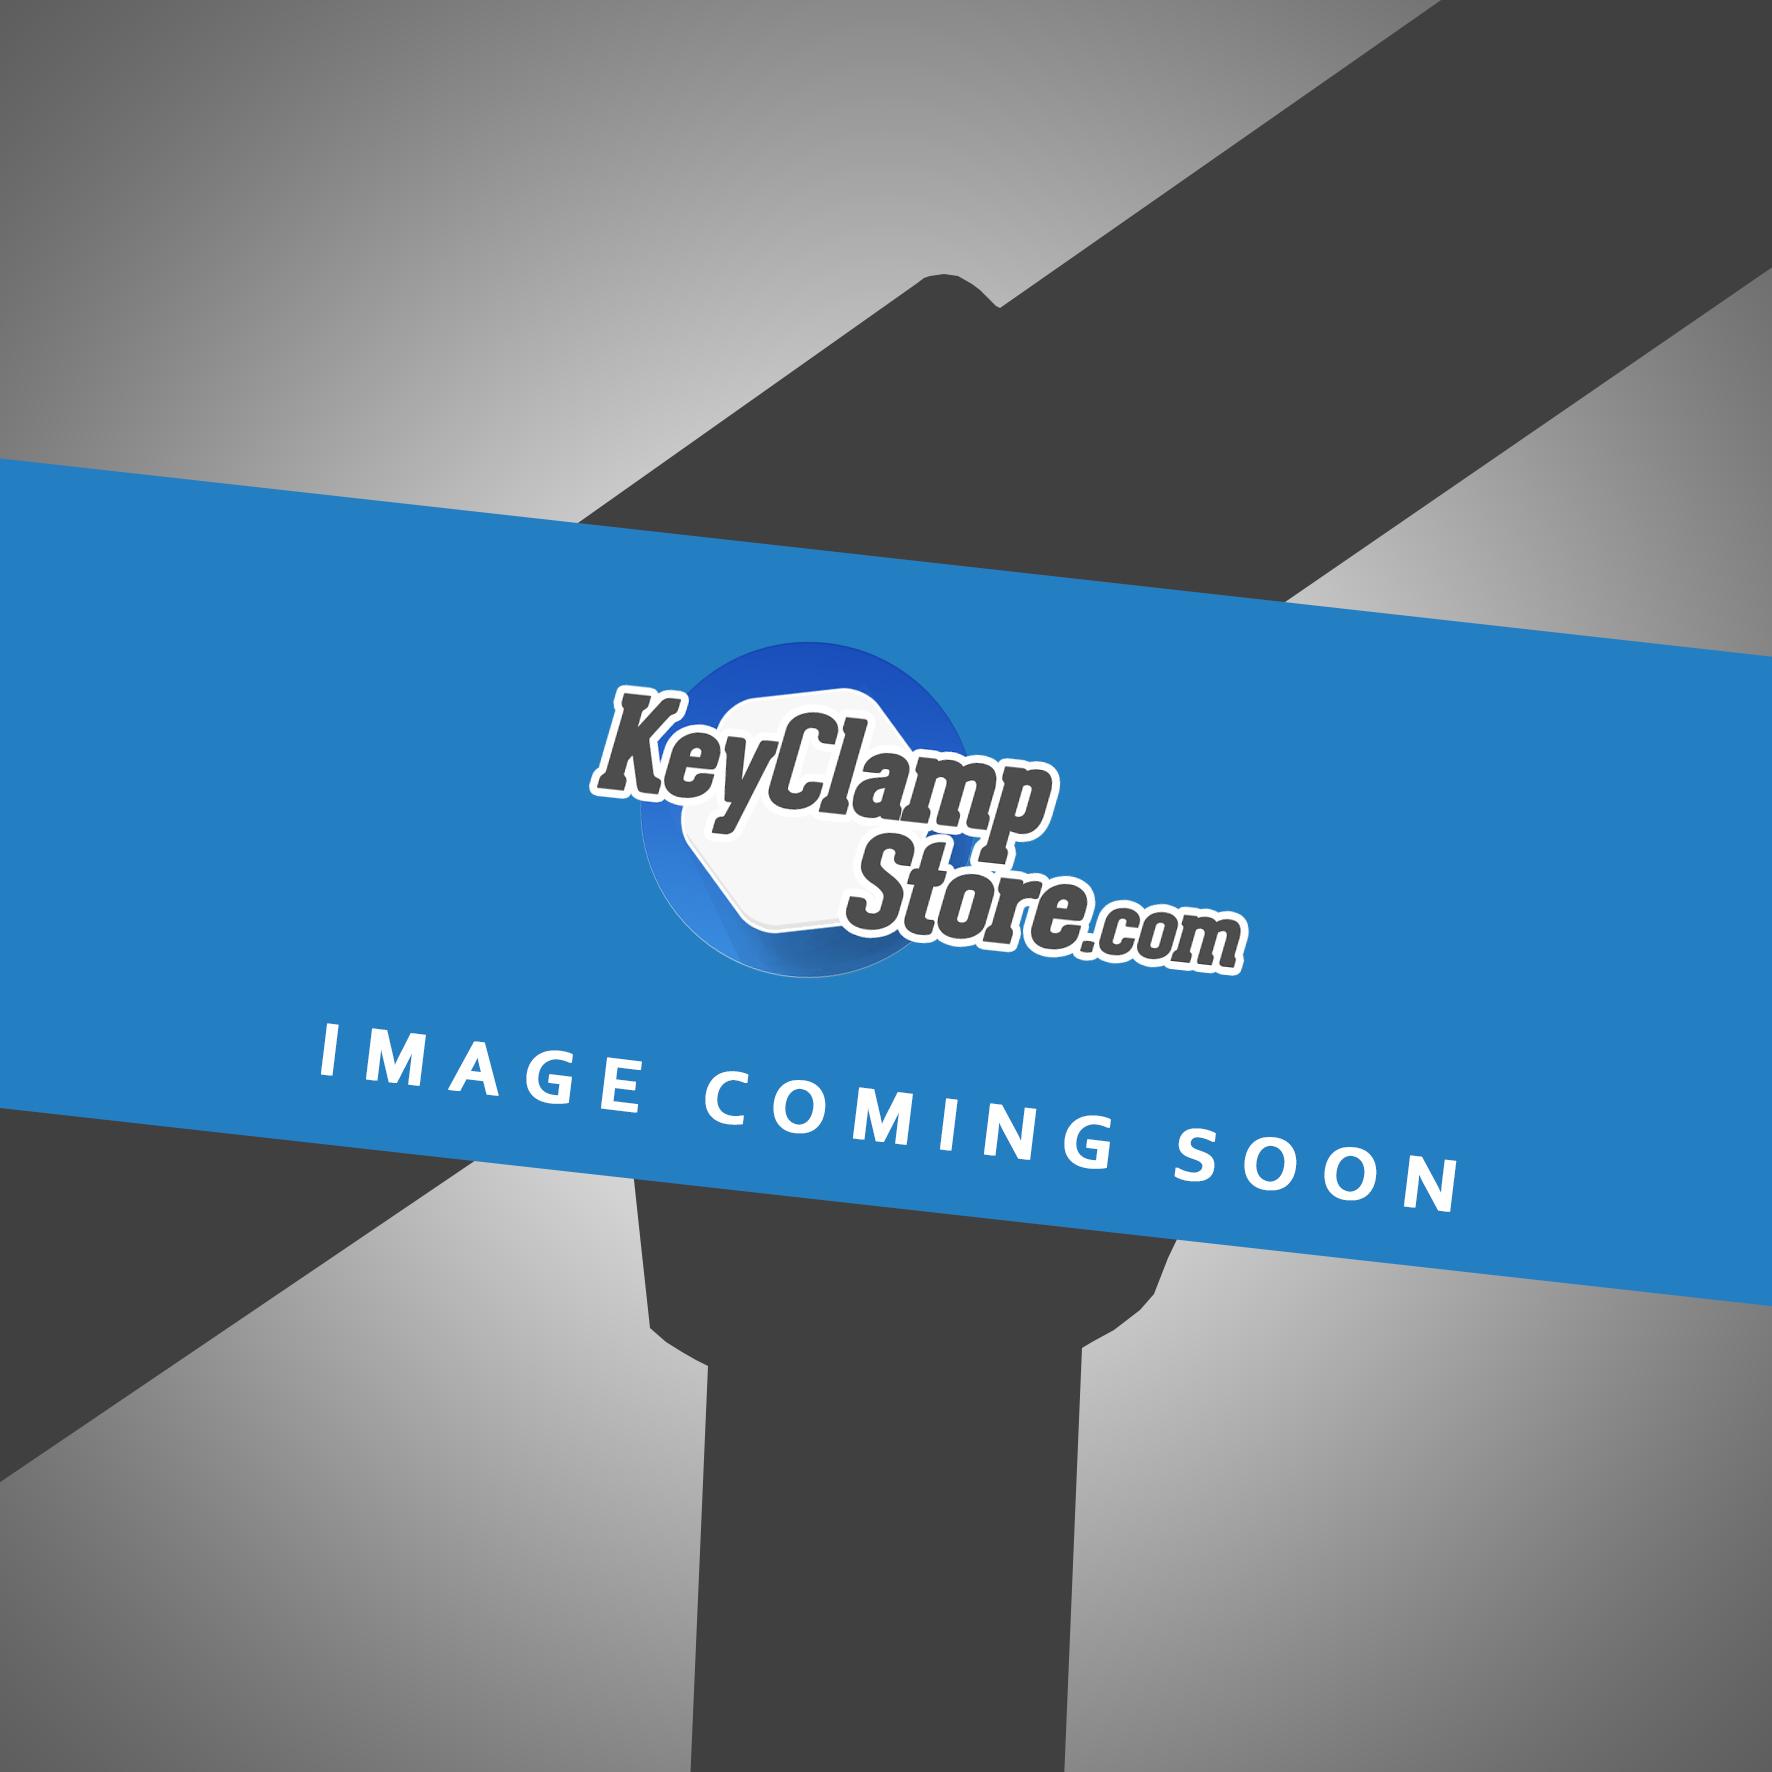 34mm PipeClamp Tubeclamp Key Clamp Tubing